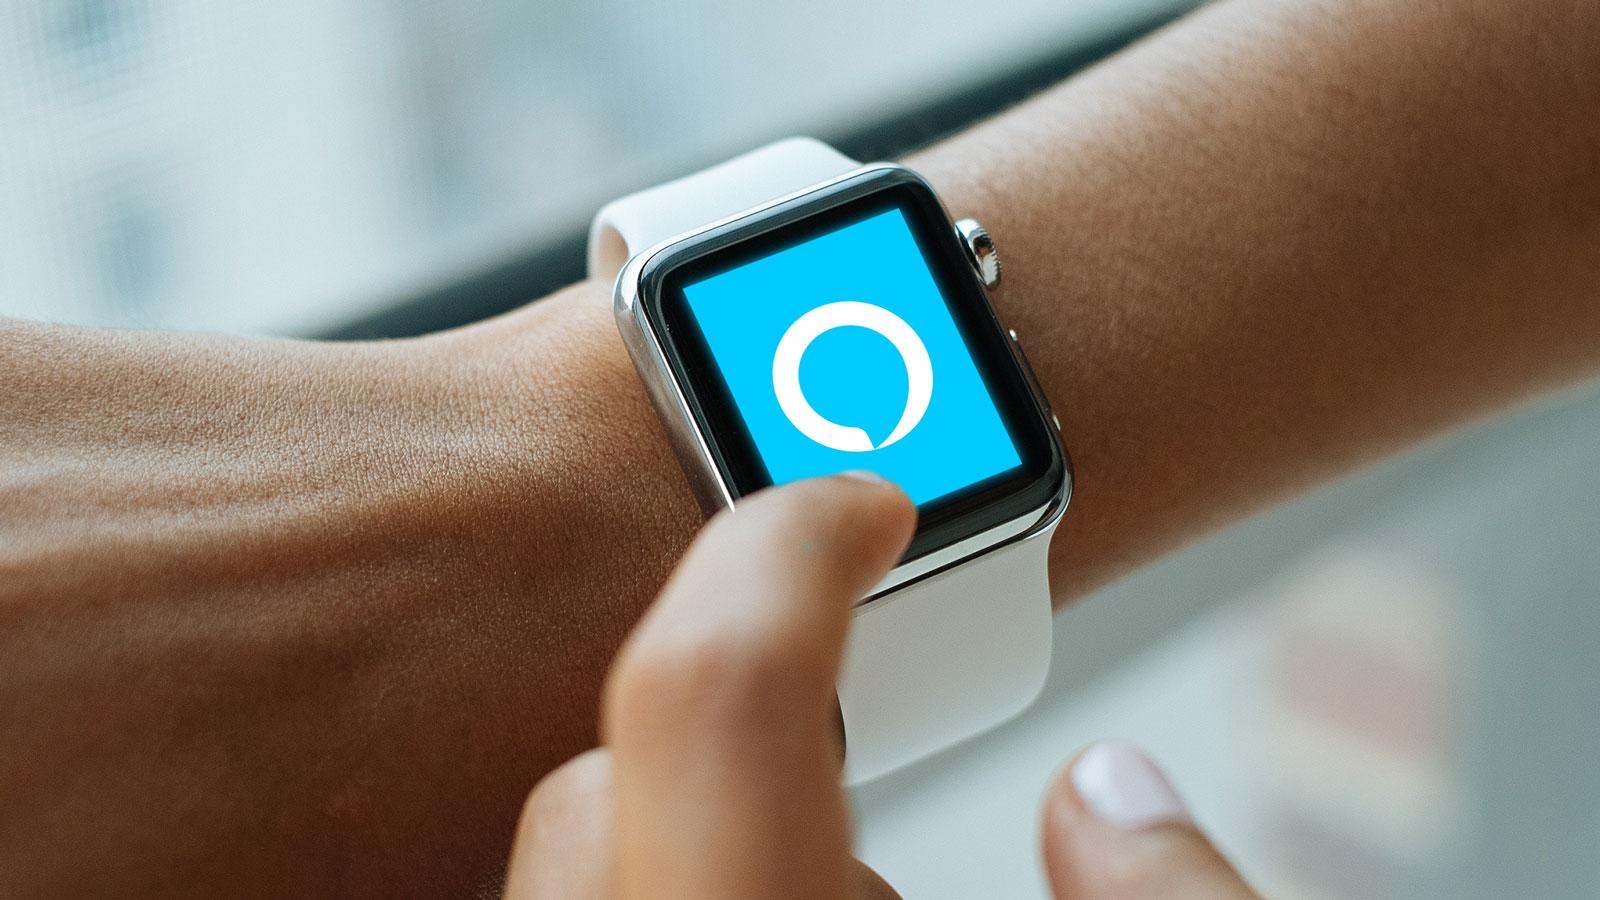 This $2 App Brings Amazon Alexa to Your Apple Watch…Sort Of